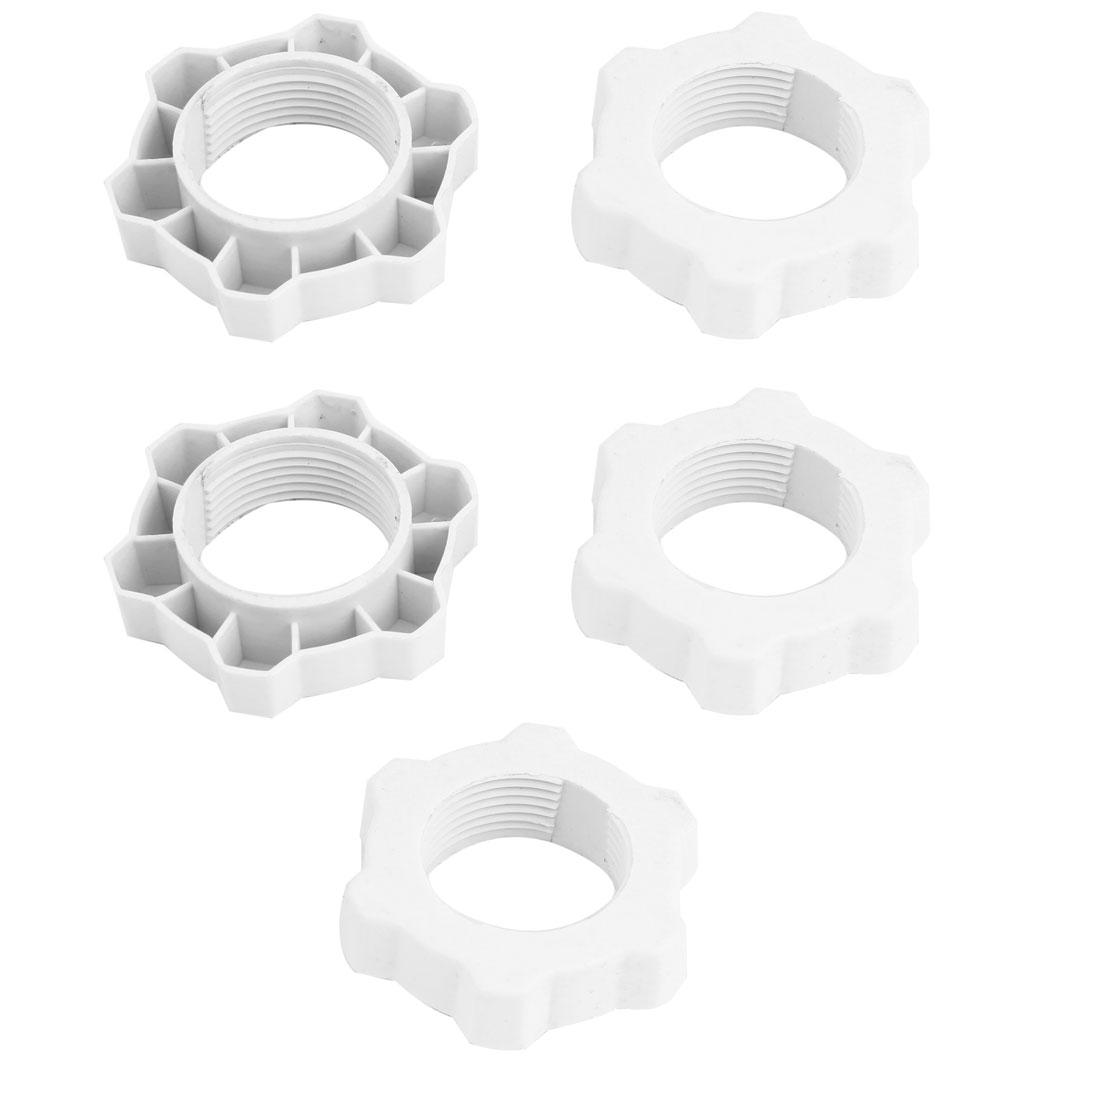 Off White Plastic 31mm Thread Fastening Screw Nut Fan Guard Fastener 5 Pcs